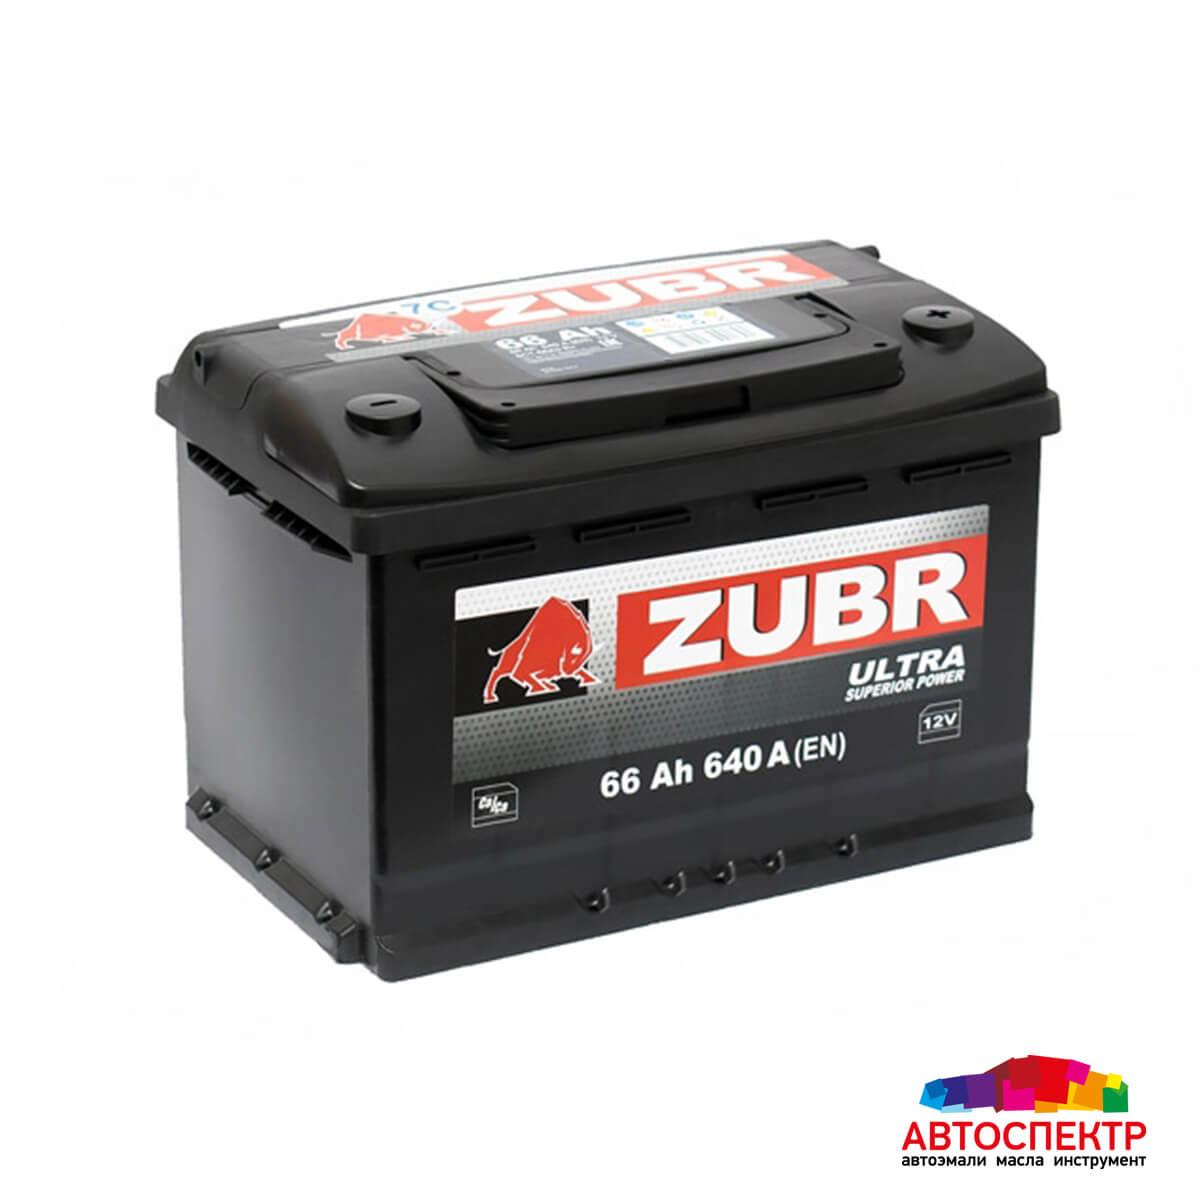 ZUBR Аккумуляторная батарея автомобильная Ultra  66 A/h обратная полярность